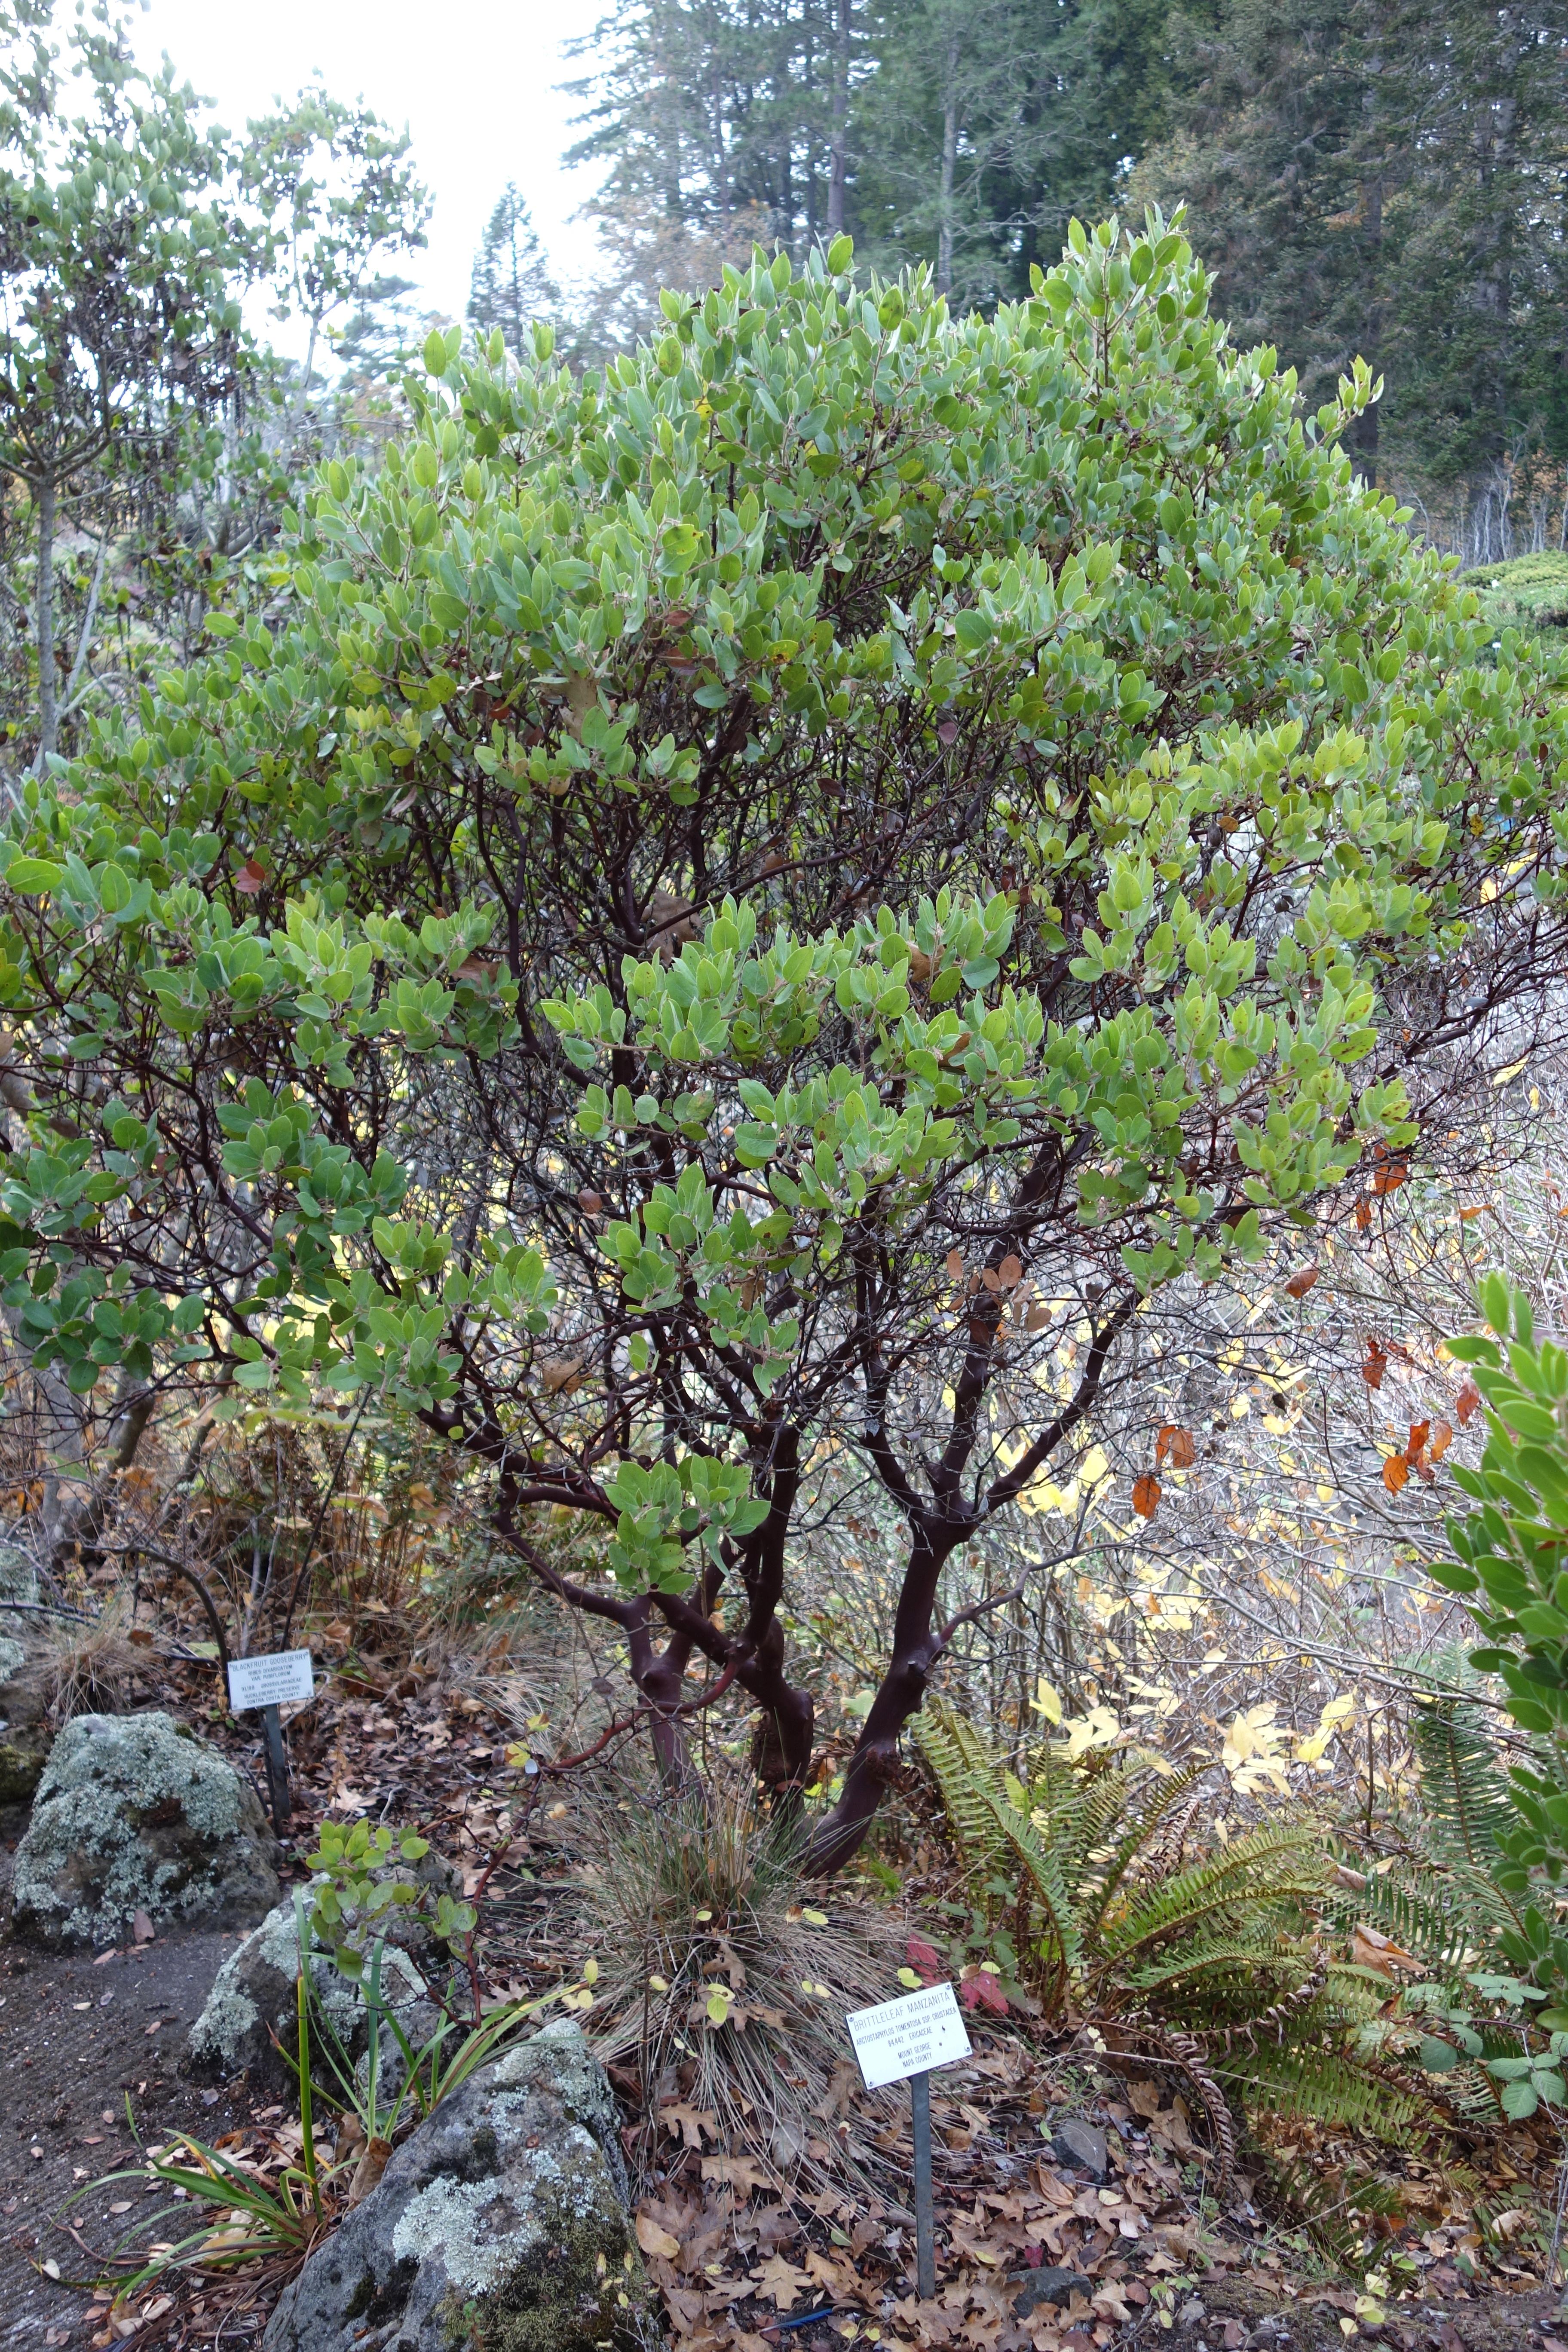 FileArctostaphylos tomentosa subsp crustacea Regional Parks